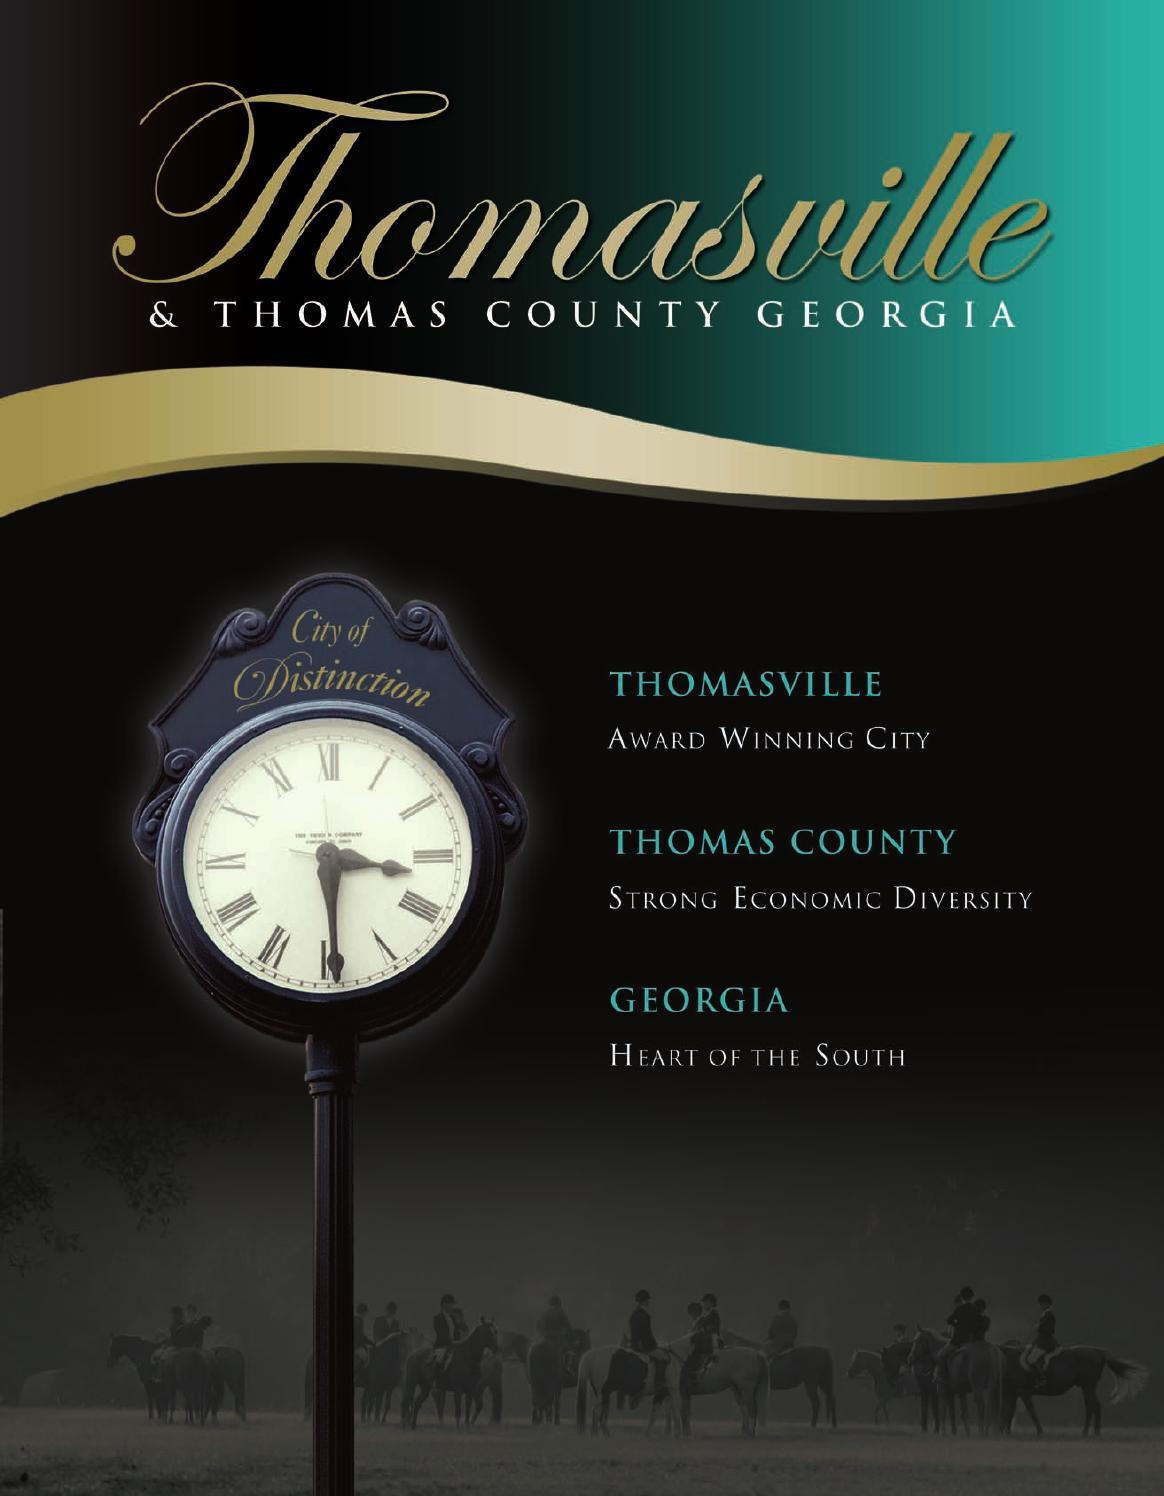 Thomasville GA Community Profile By Townsquare Publications LLC